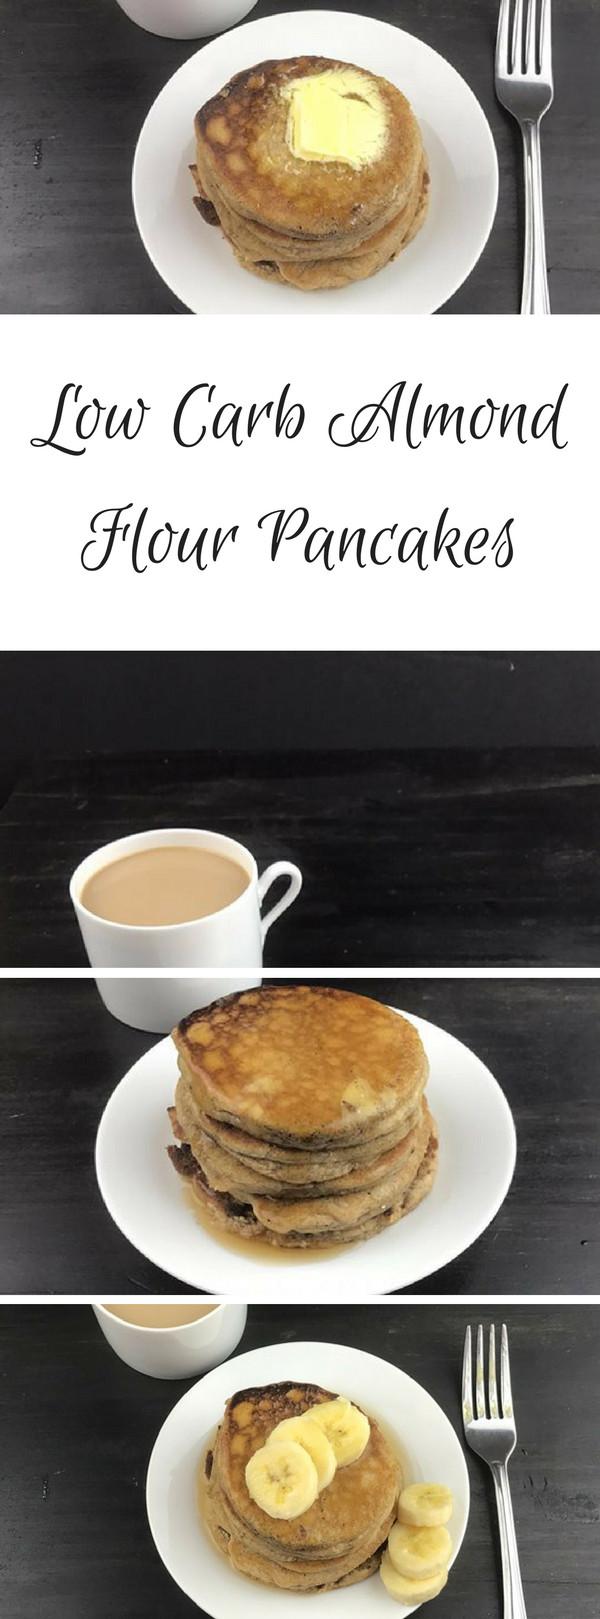 Low Carb Almond Flour Pancakes  Low Carb Almond Flour Pancakes ⋆ by Pink